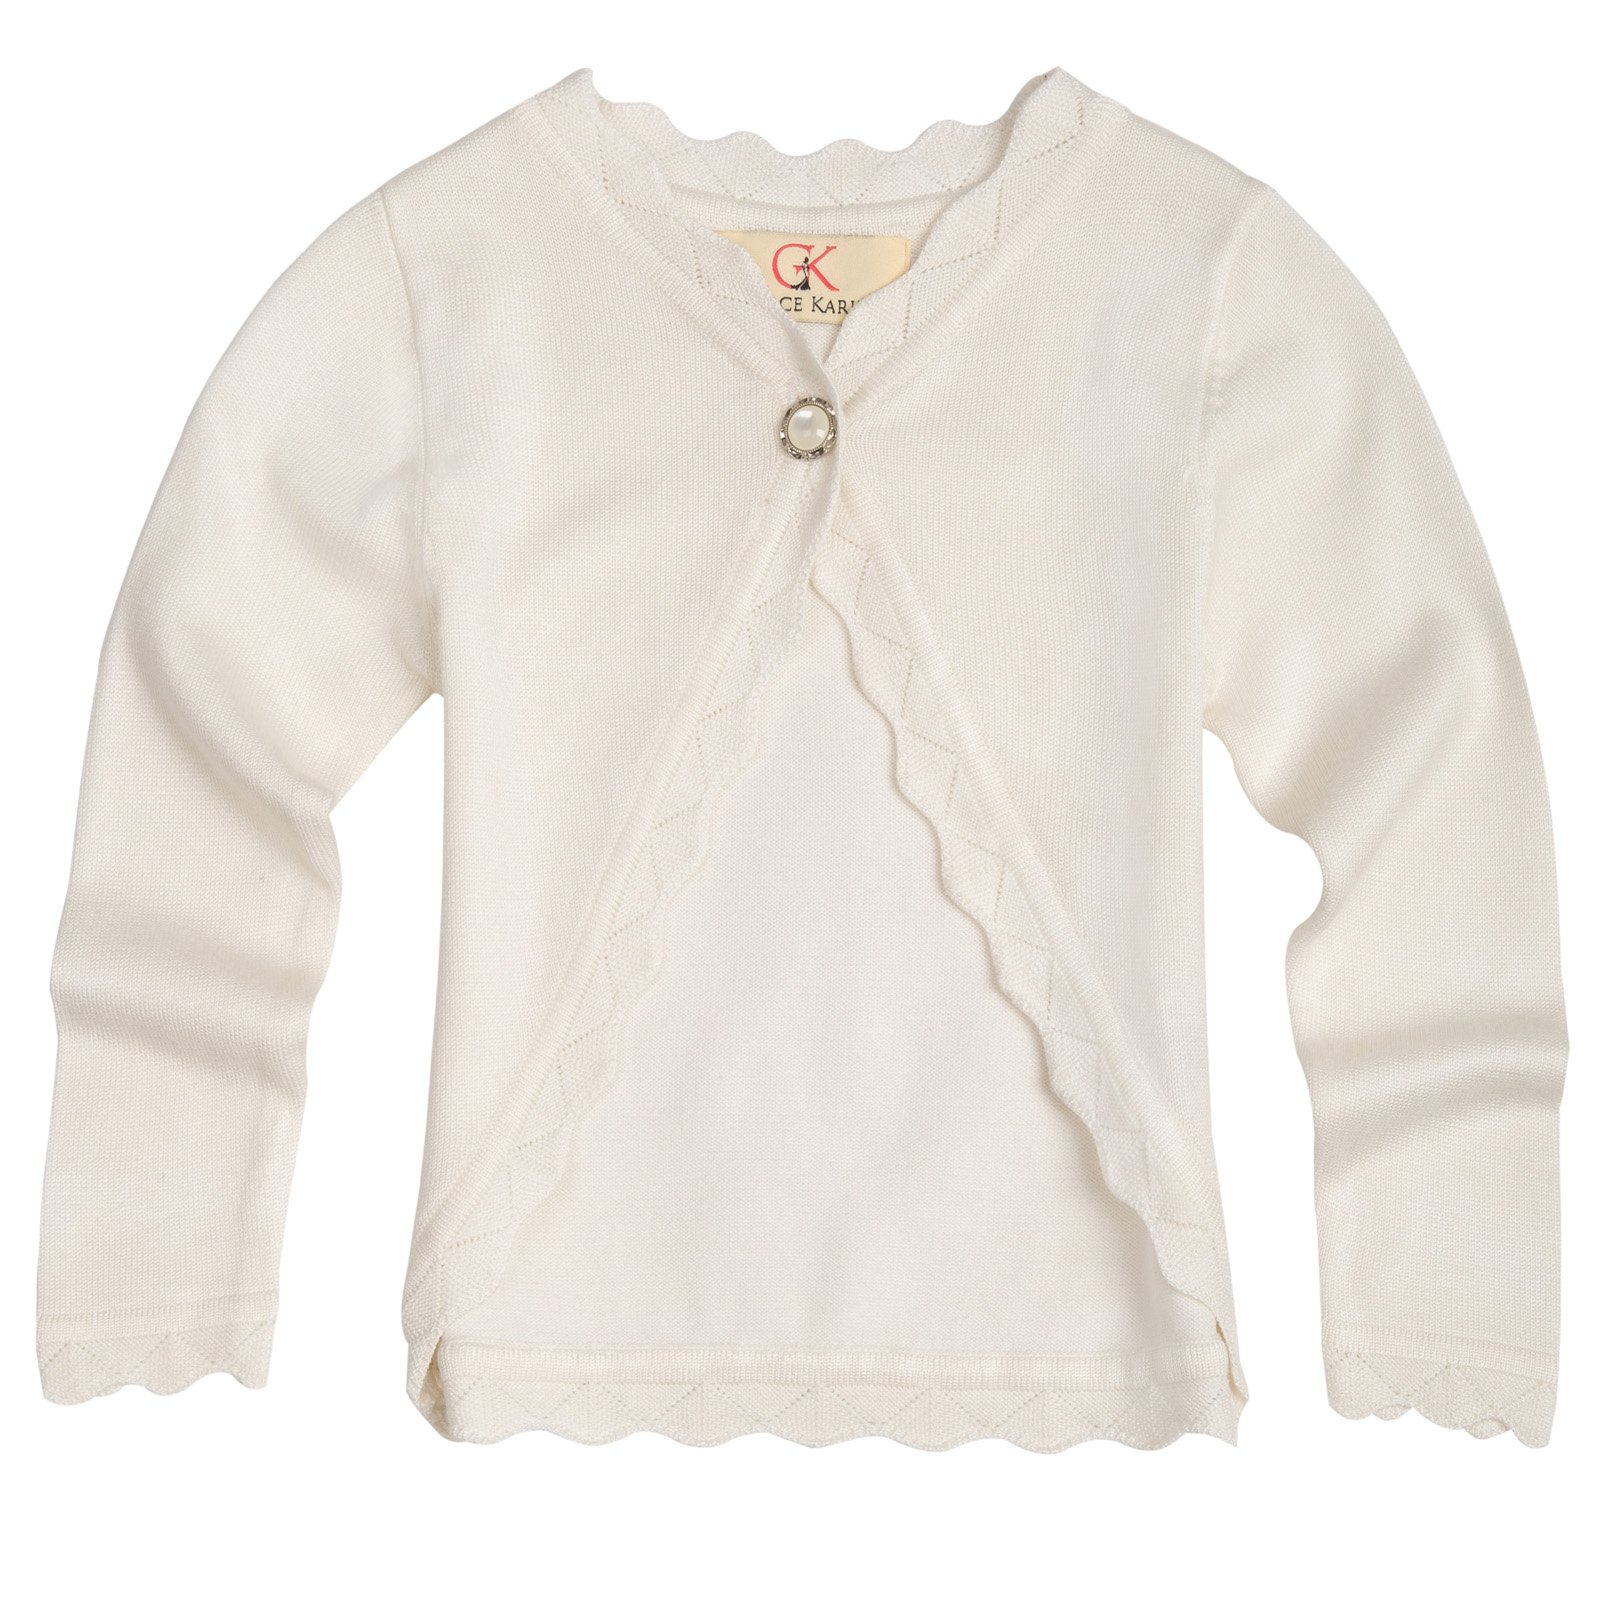 Baby Girls Cardigan Sweater One Button Bolero 7-8yrs AM1019-1